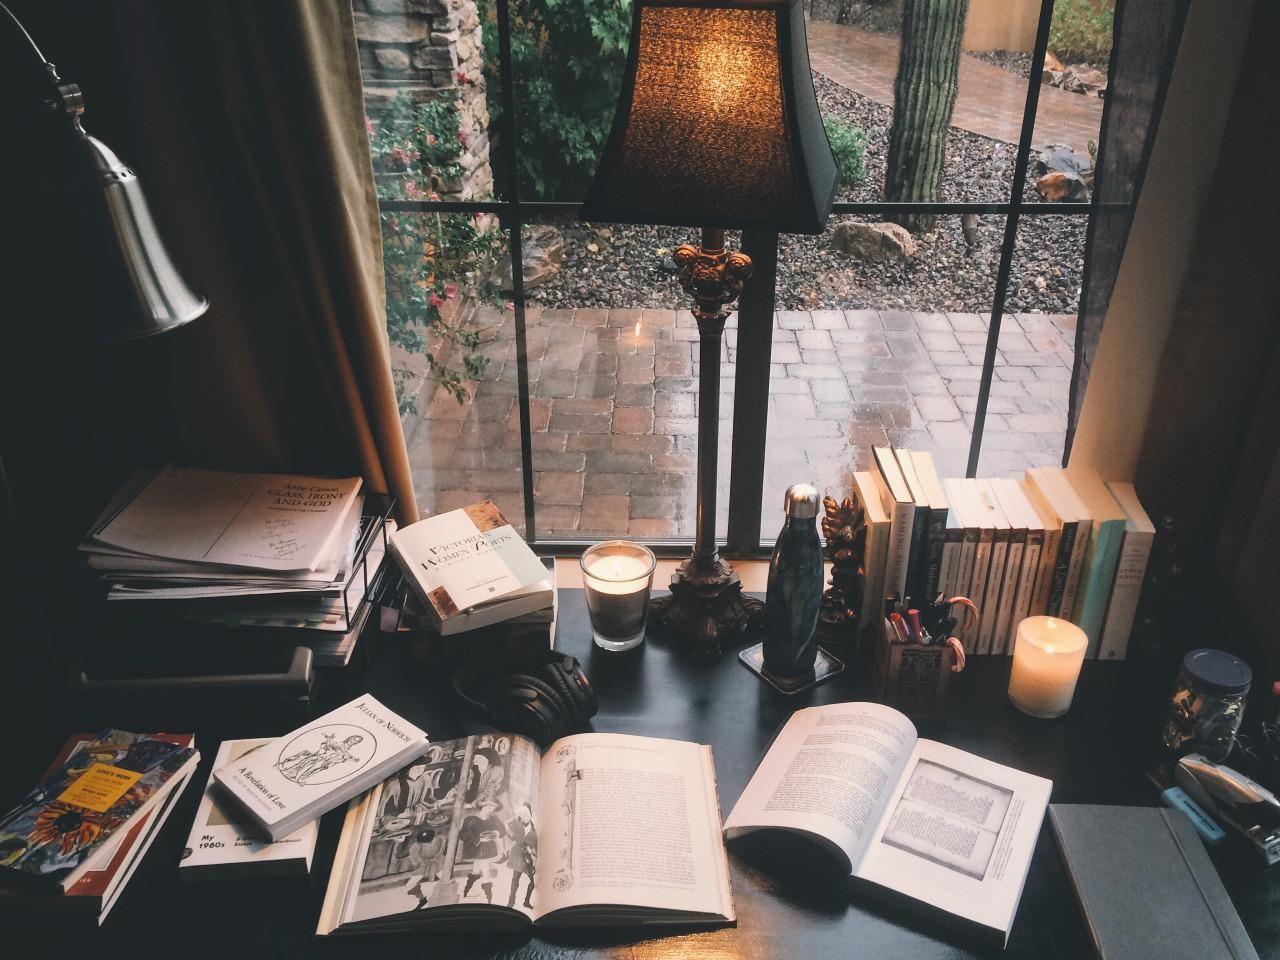 reading a book on a rainy day decorate study inspiration study rh pinterest com